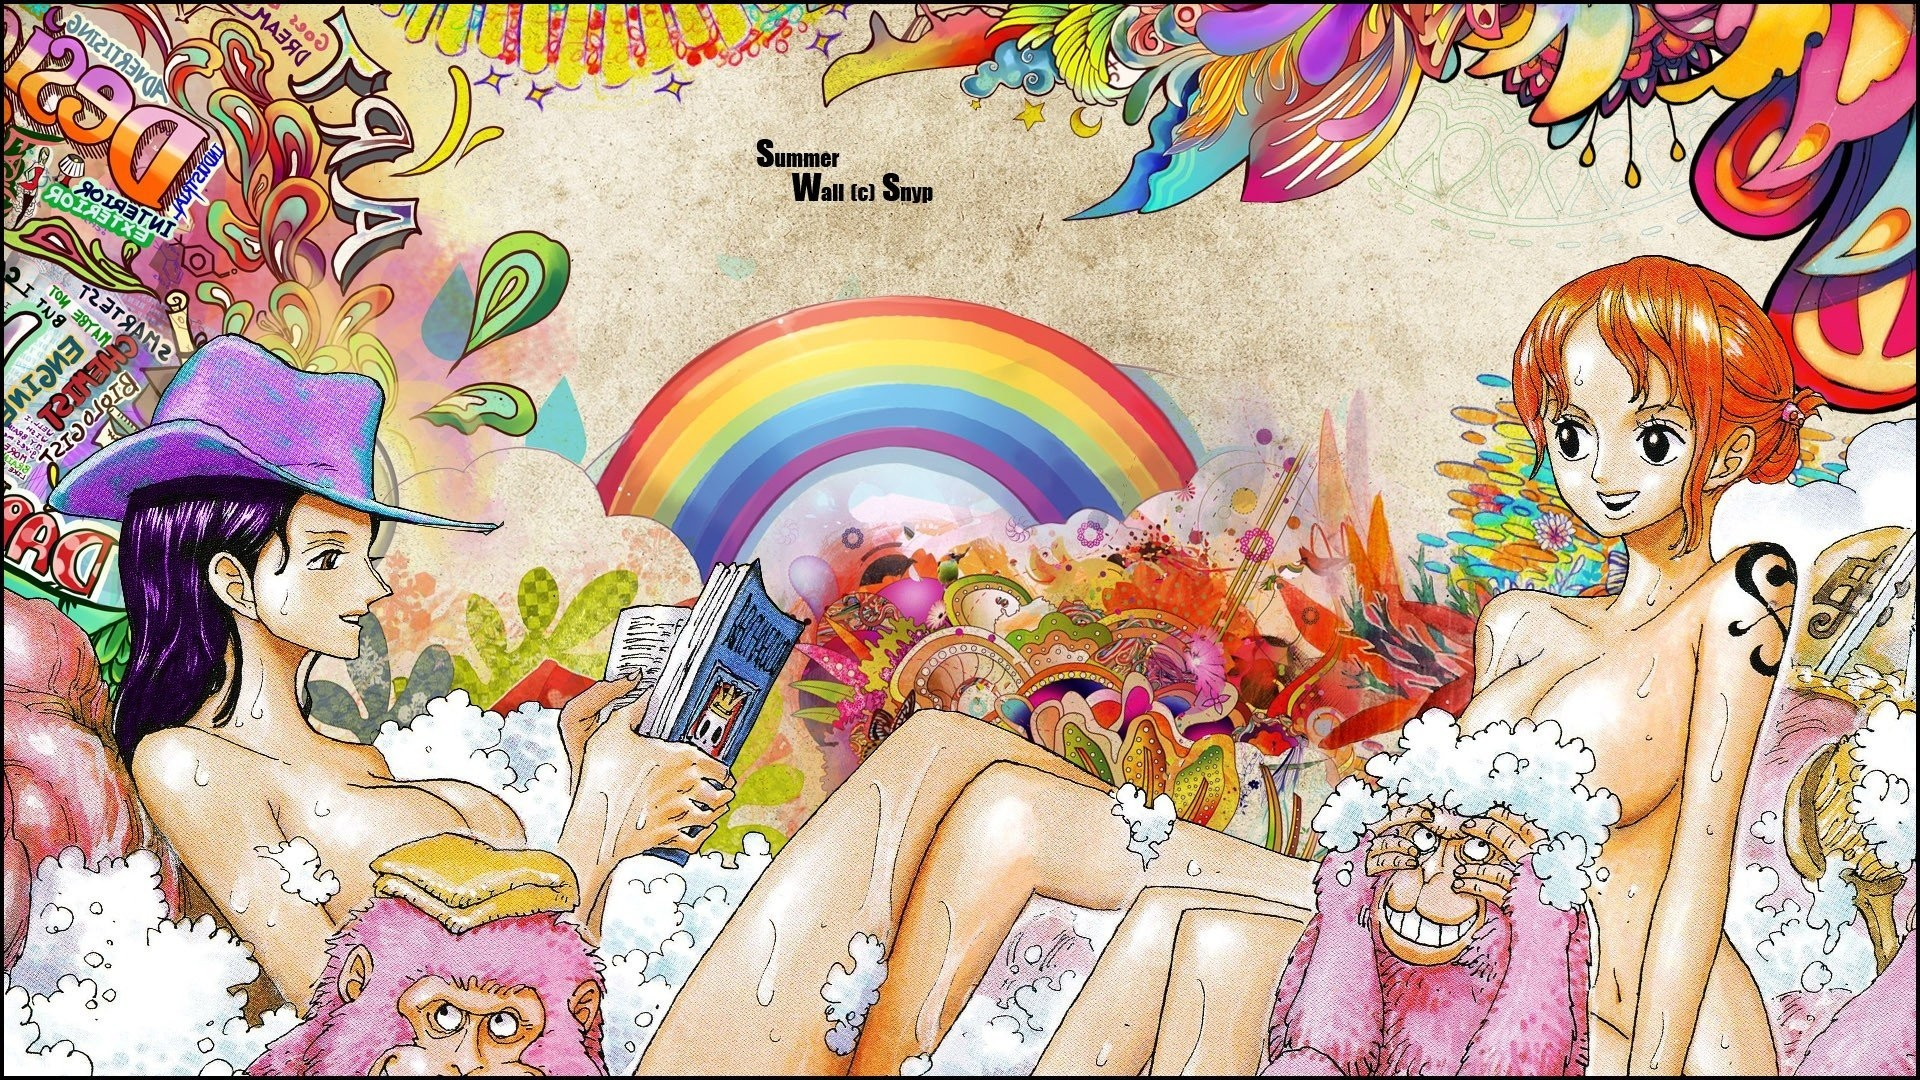 Res: 1920x1080, 1920x1200 One Piece, Roronoa Zoro, Usopp, Nico Robin, Nami Wallpaper